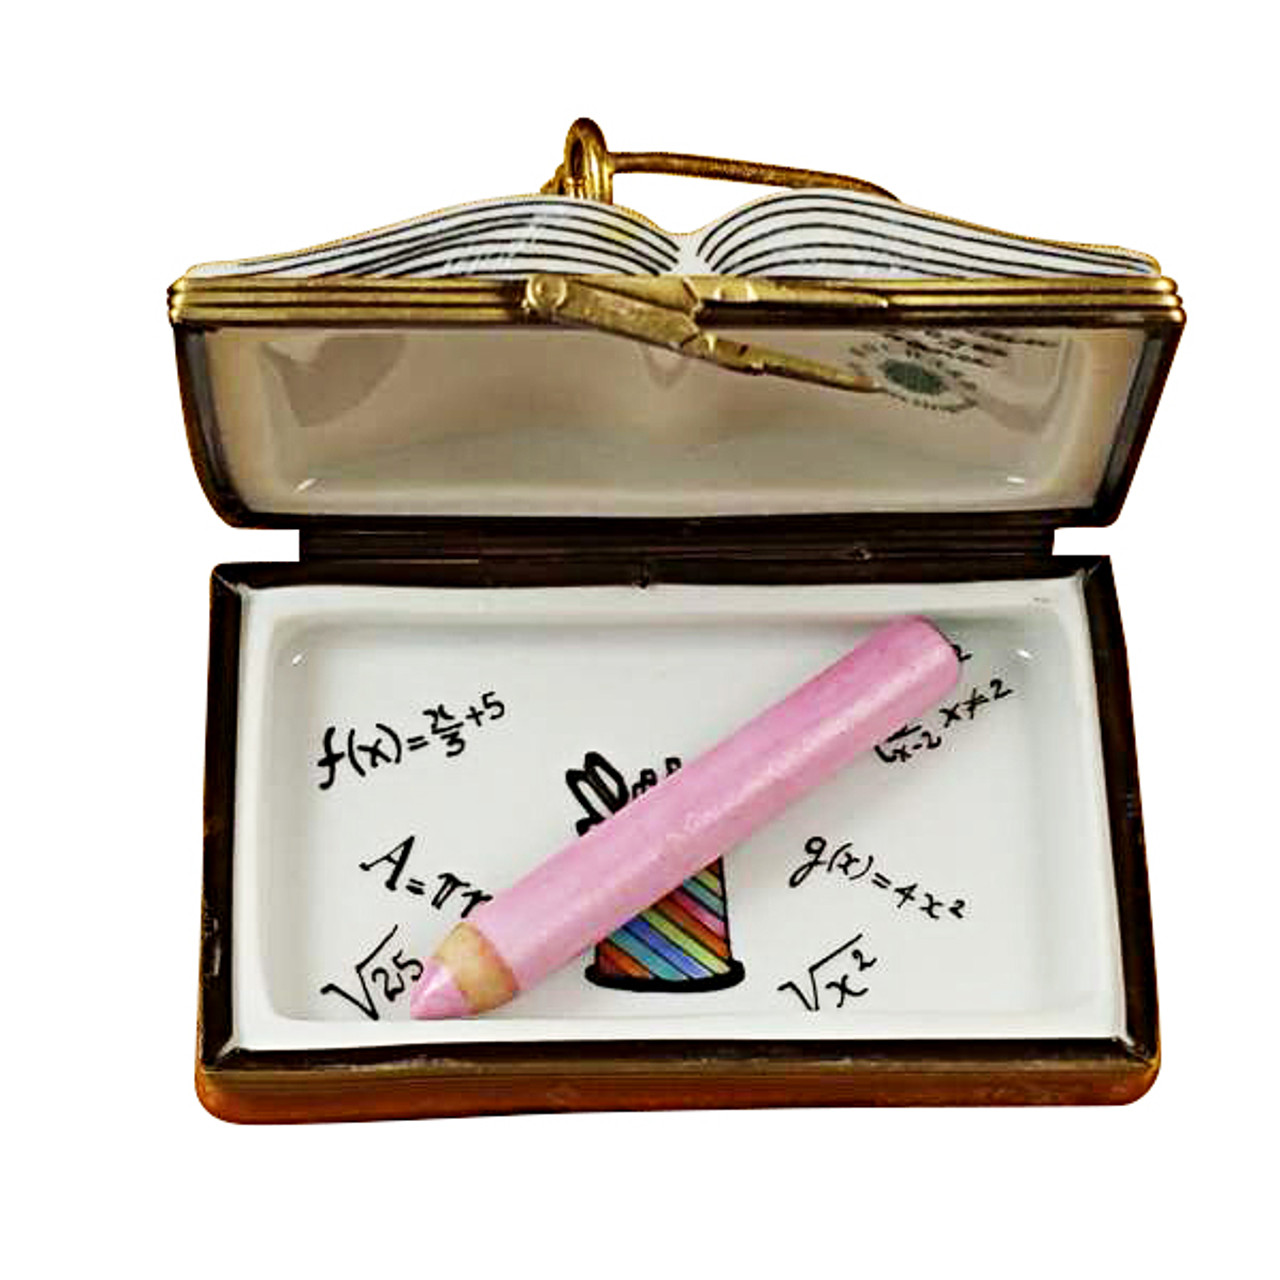 I Love My Teacher Book Rochard Limoges Box